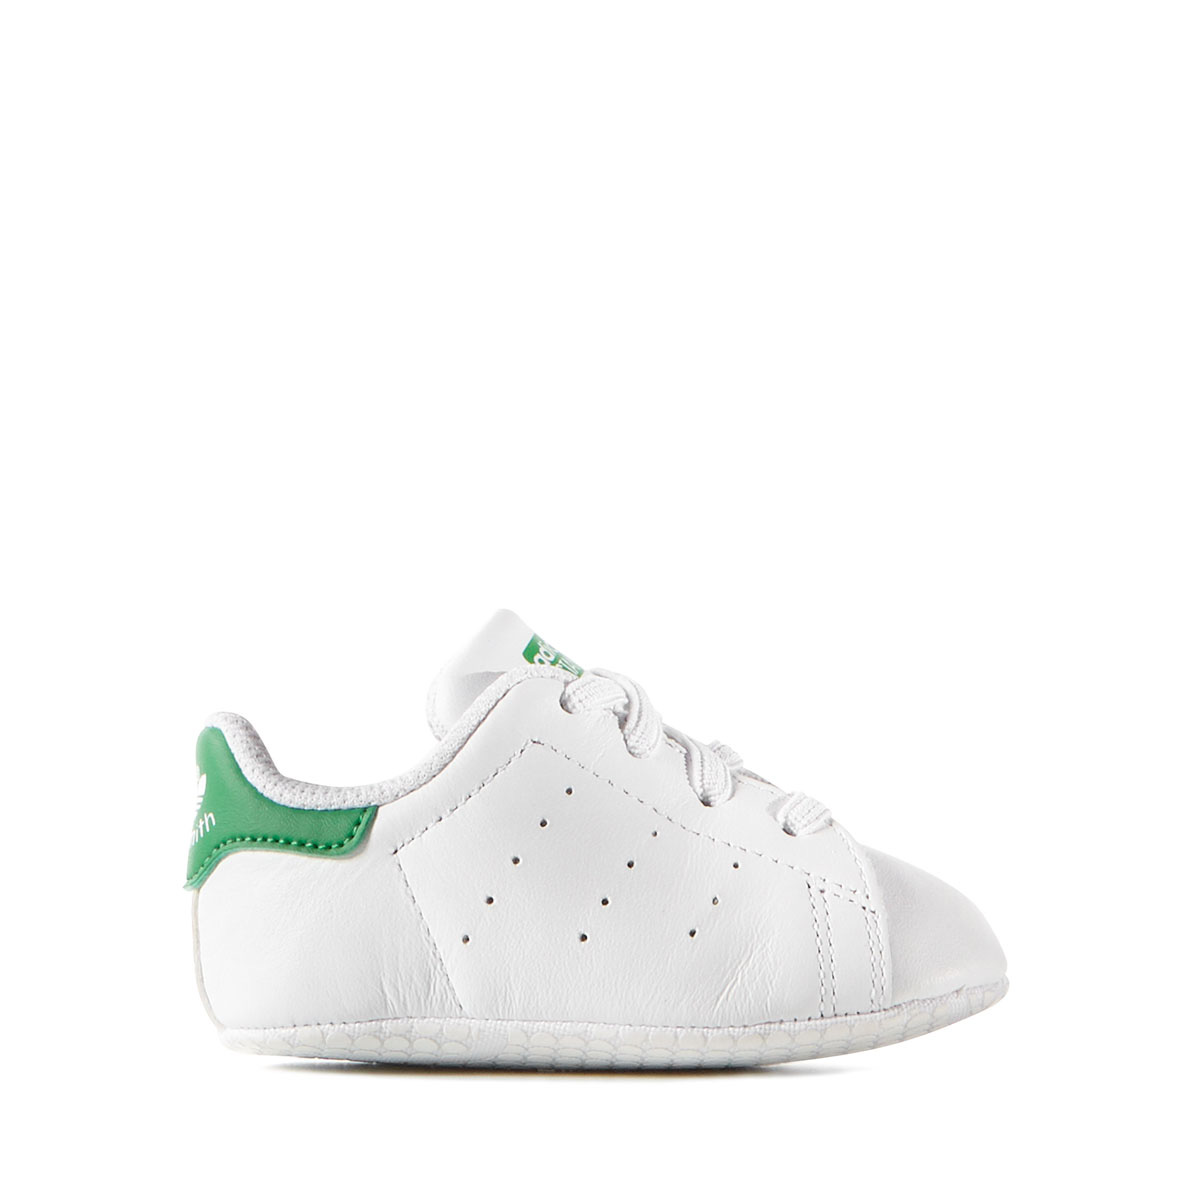 95c5426c0 adidas Originals STAN SMITH CRIB (Adidas originals Stan Smith crib) Running  White Ftw   Running White Ftw   Green 18SS-I